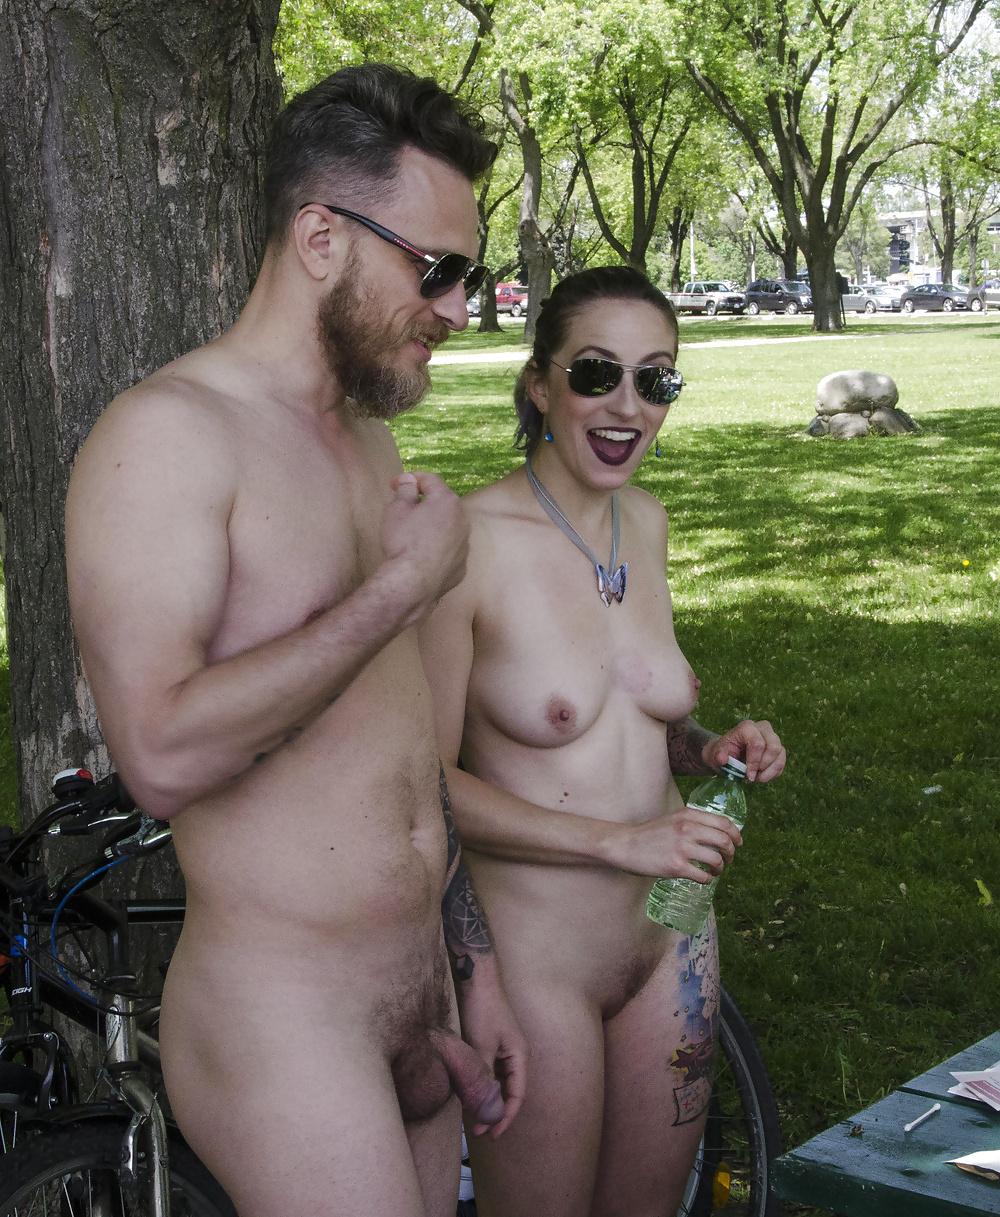 nude-couple-hammock